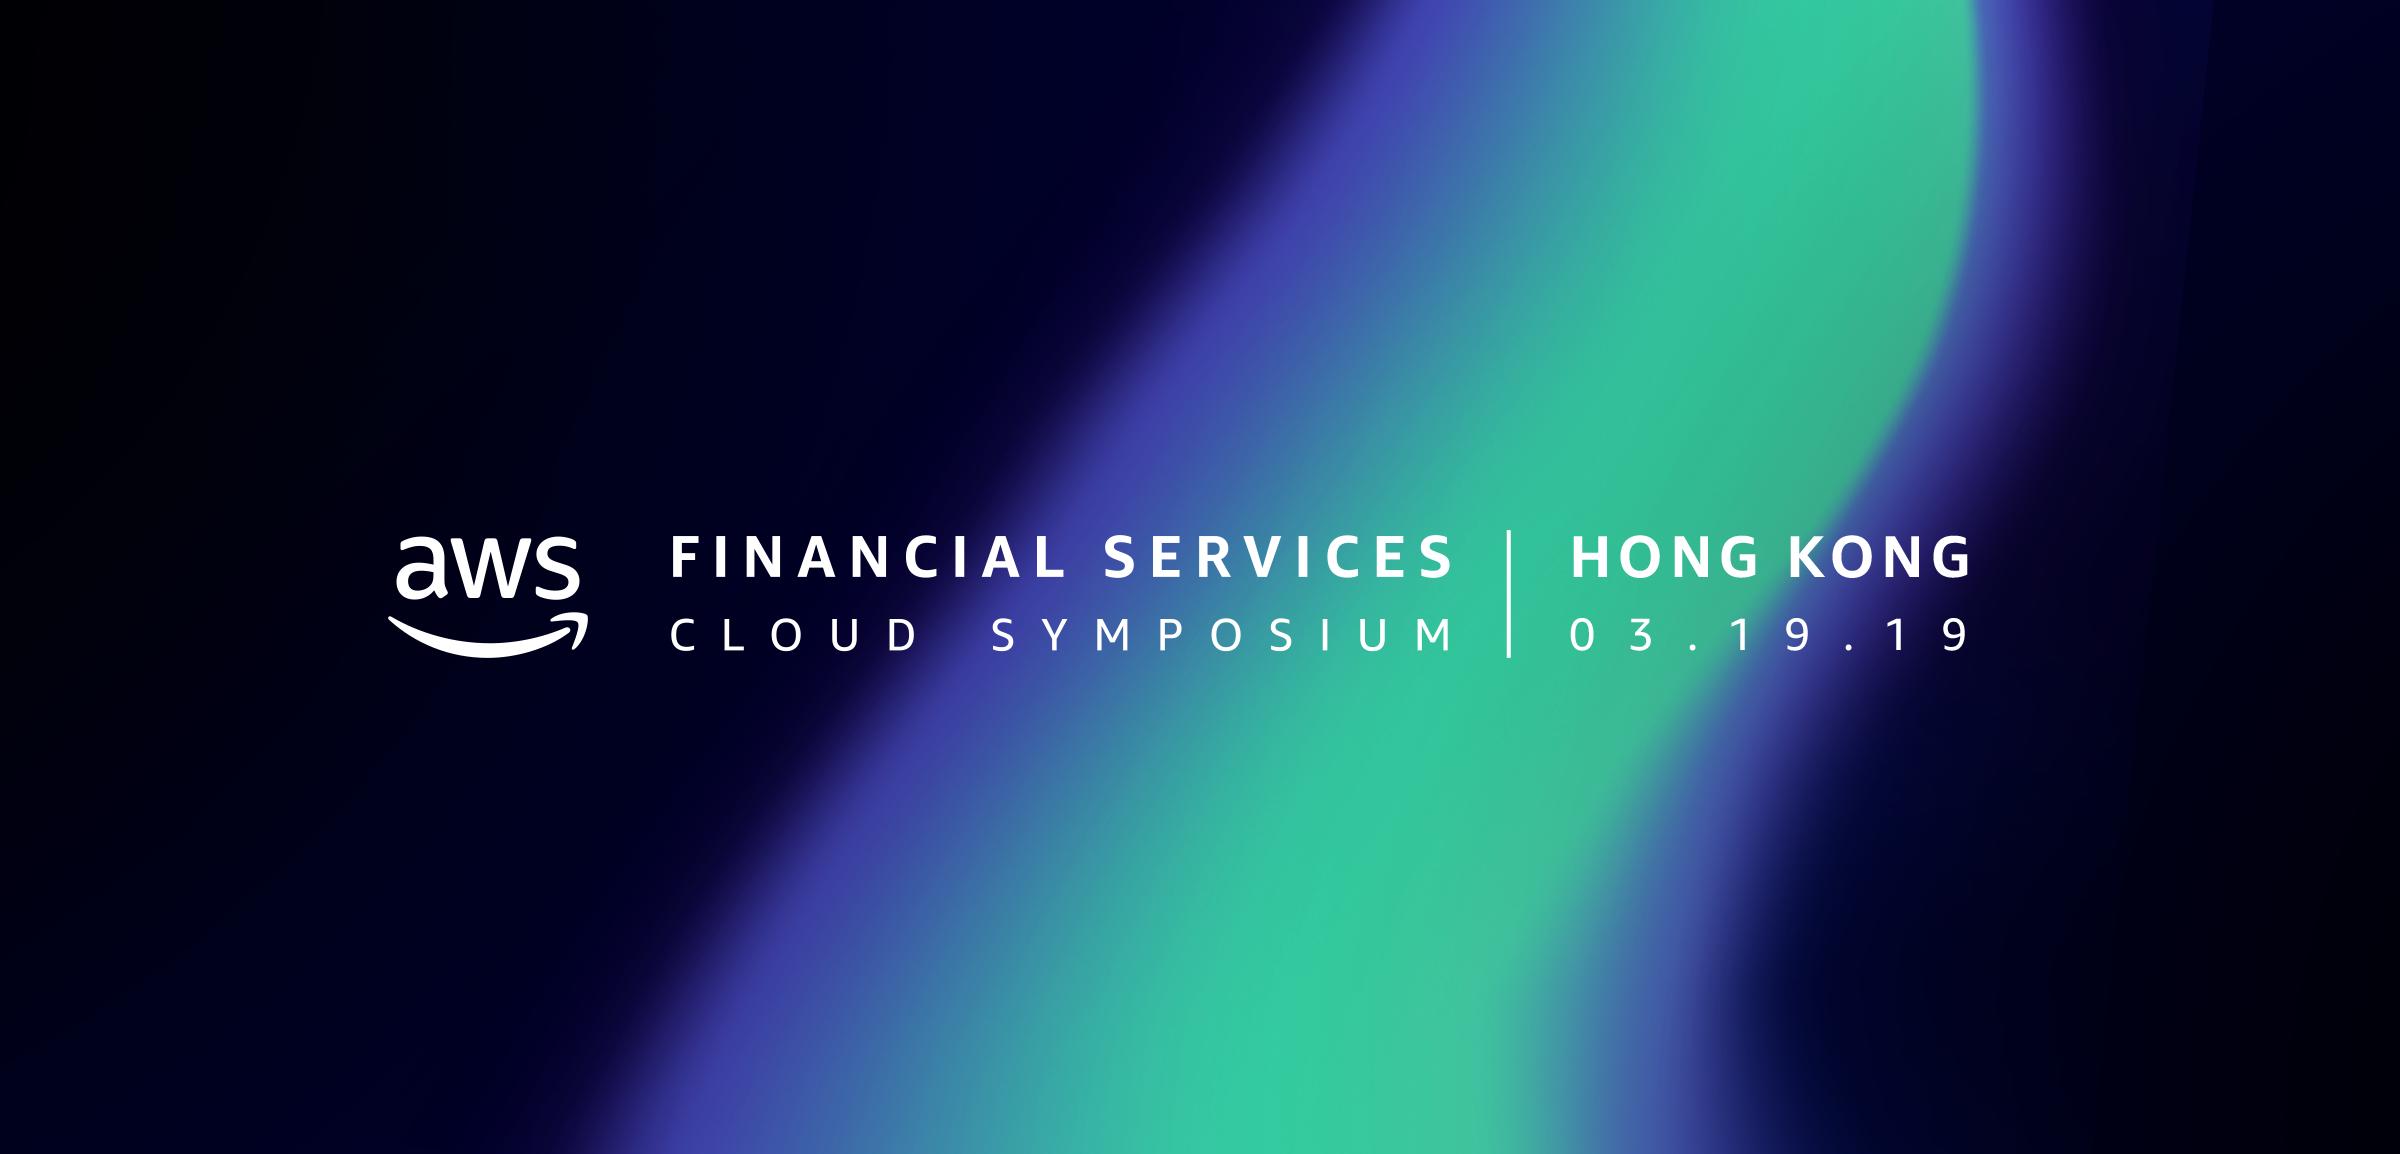 AWS Financial Services Cloud Symposium   Hong Kong